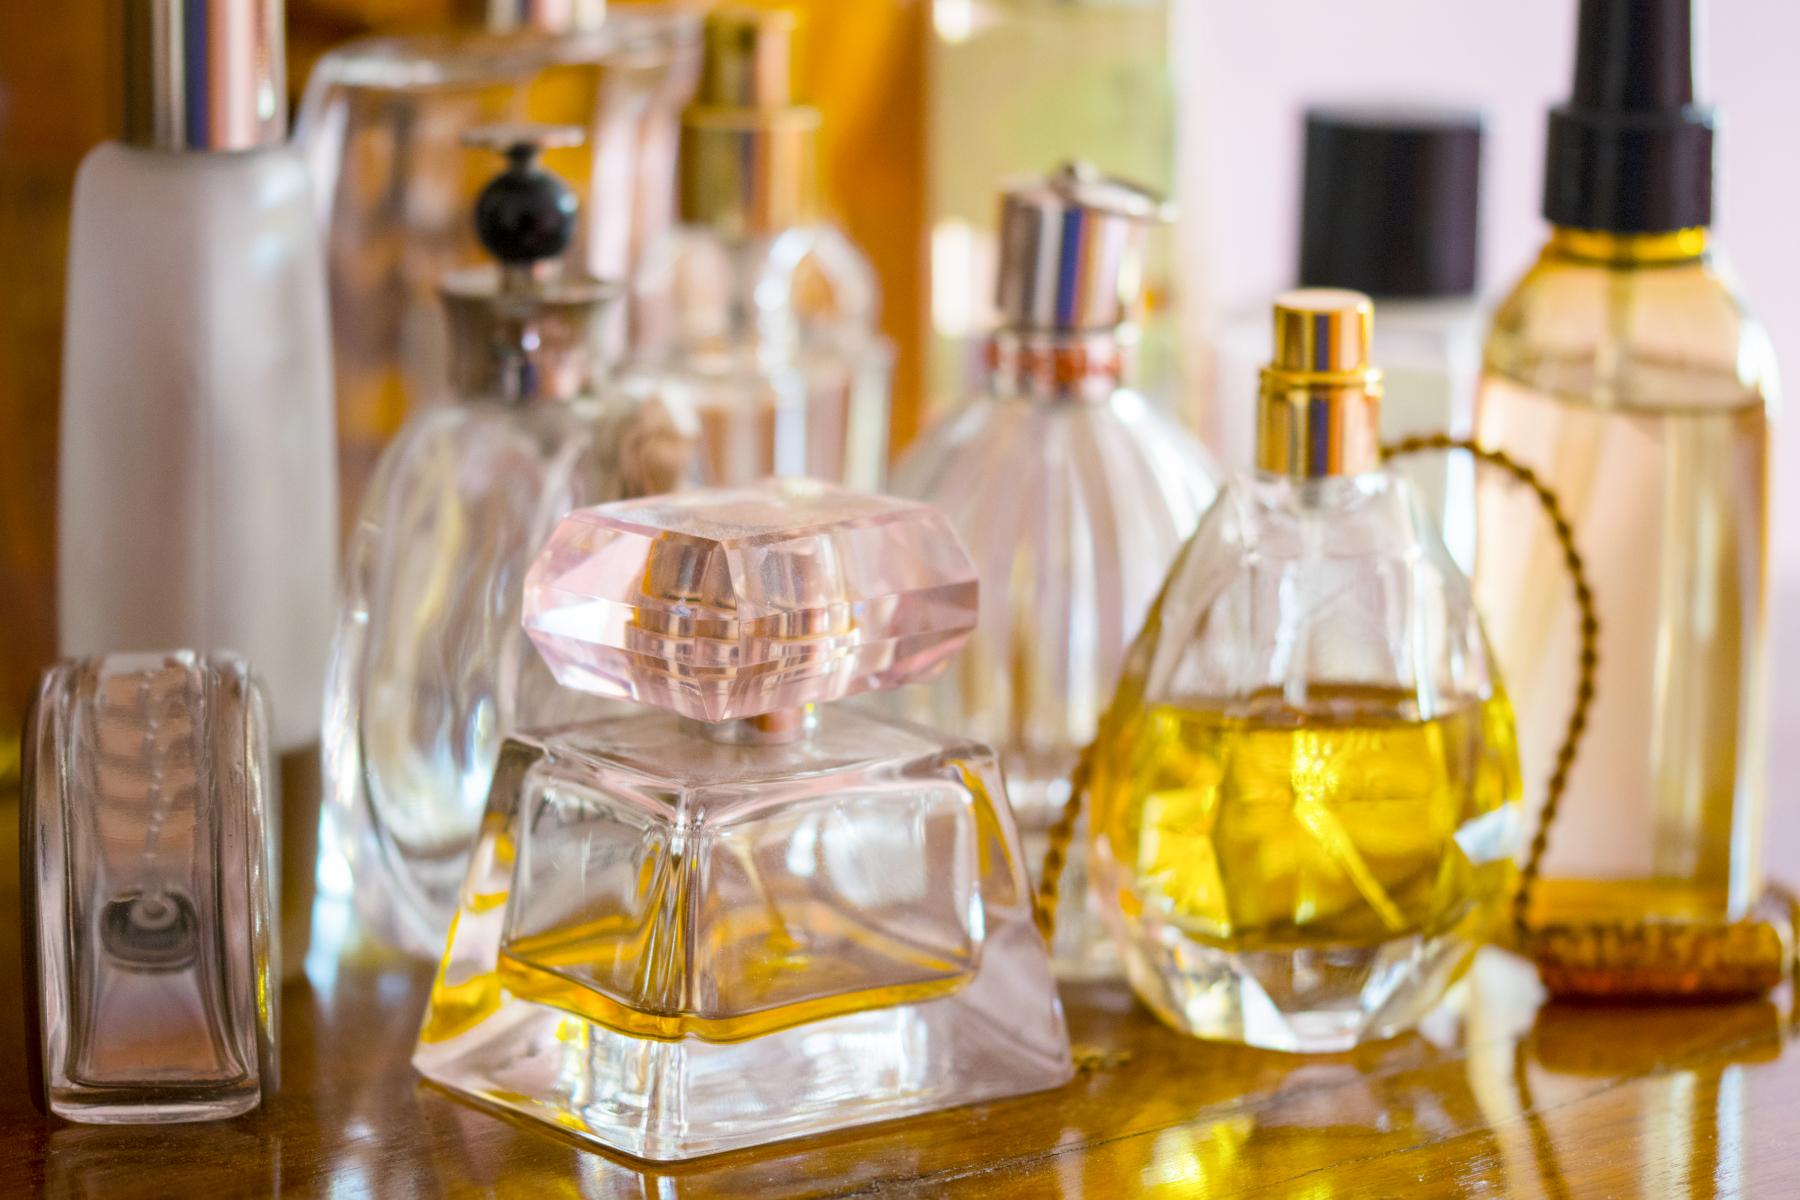 Ulike parfymeflasker med innhold